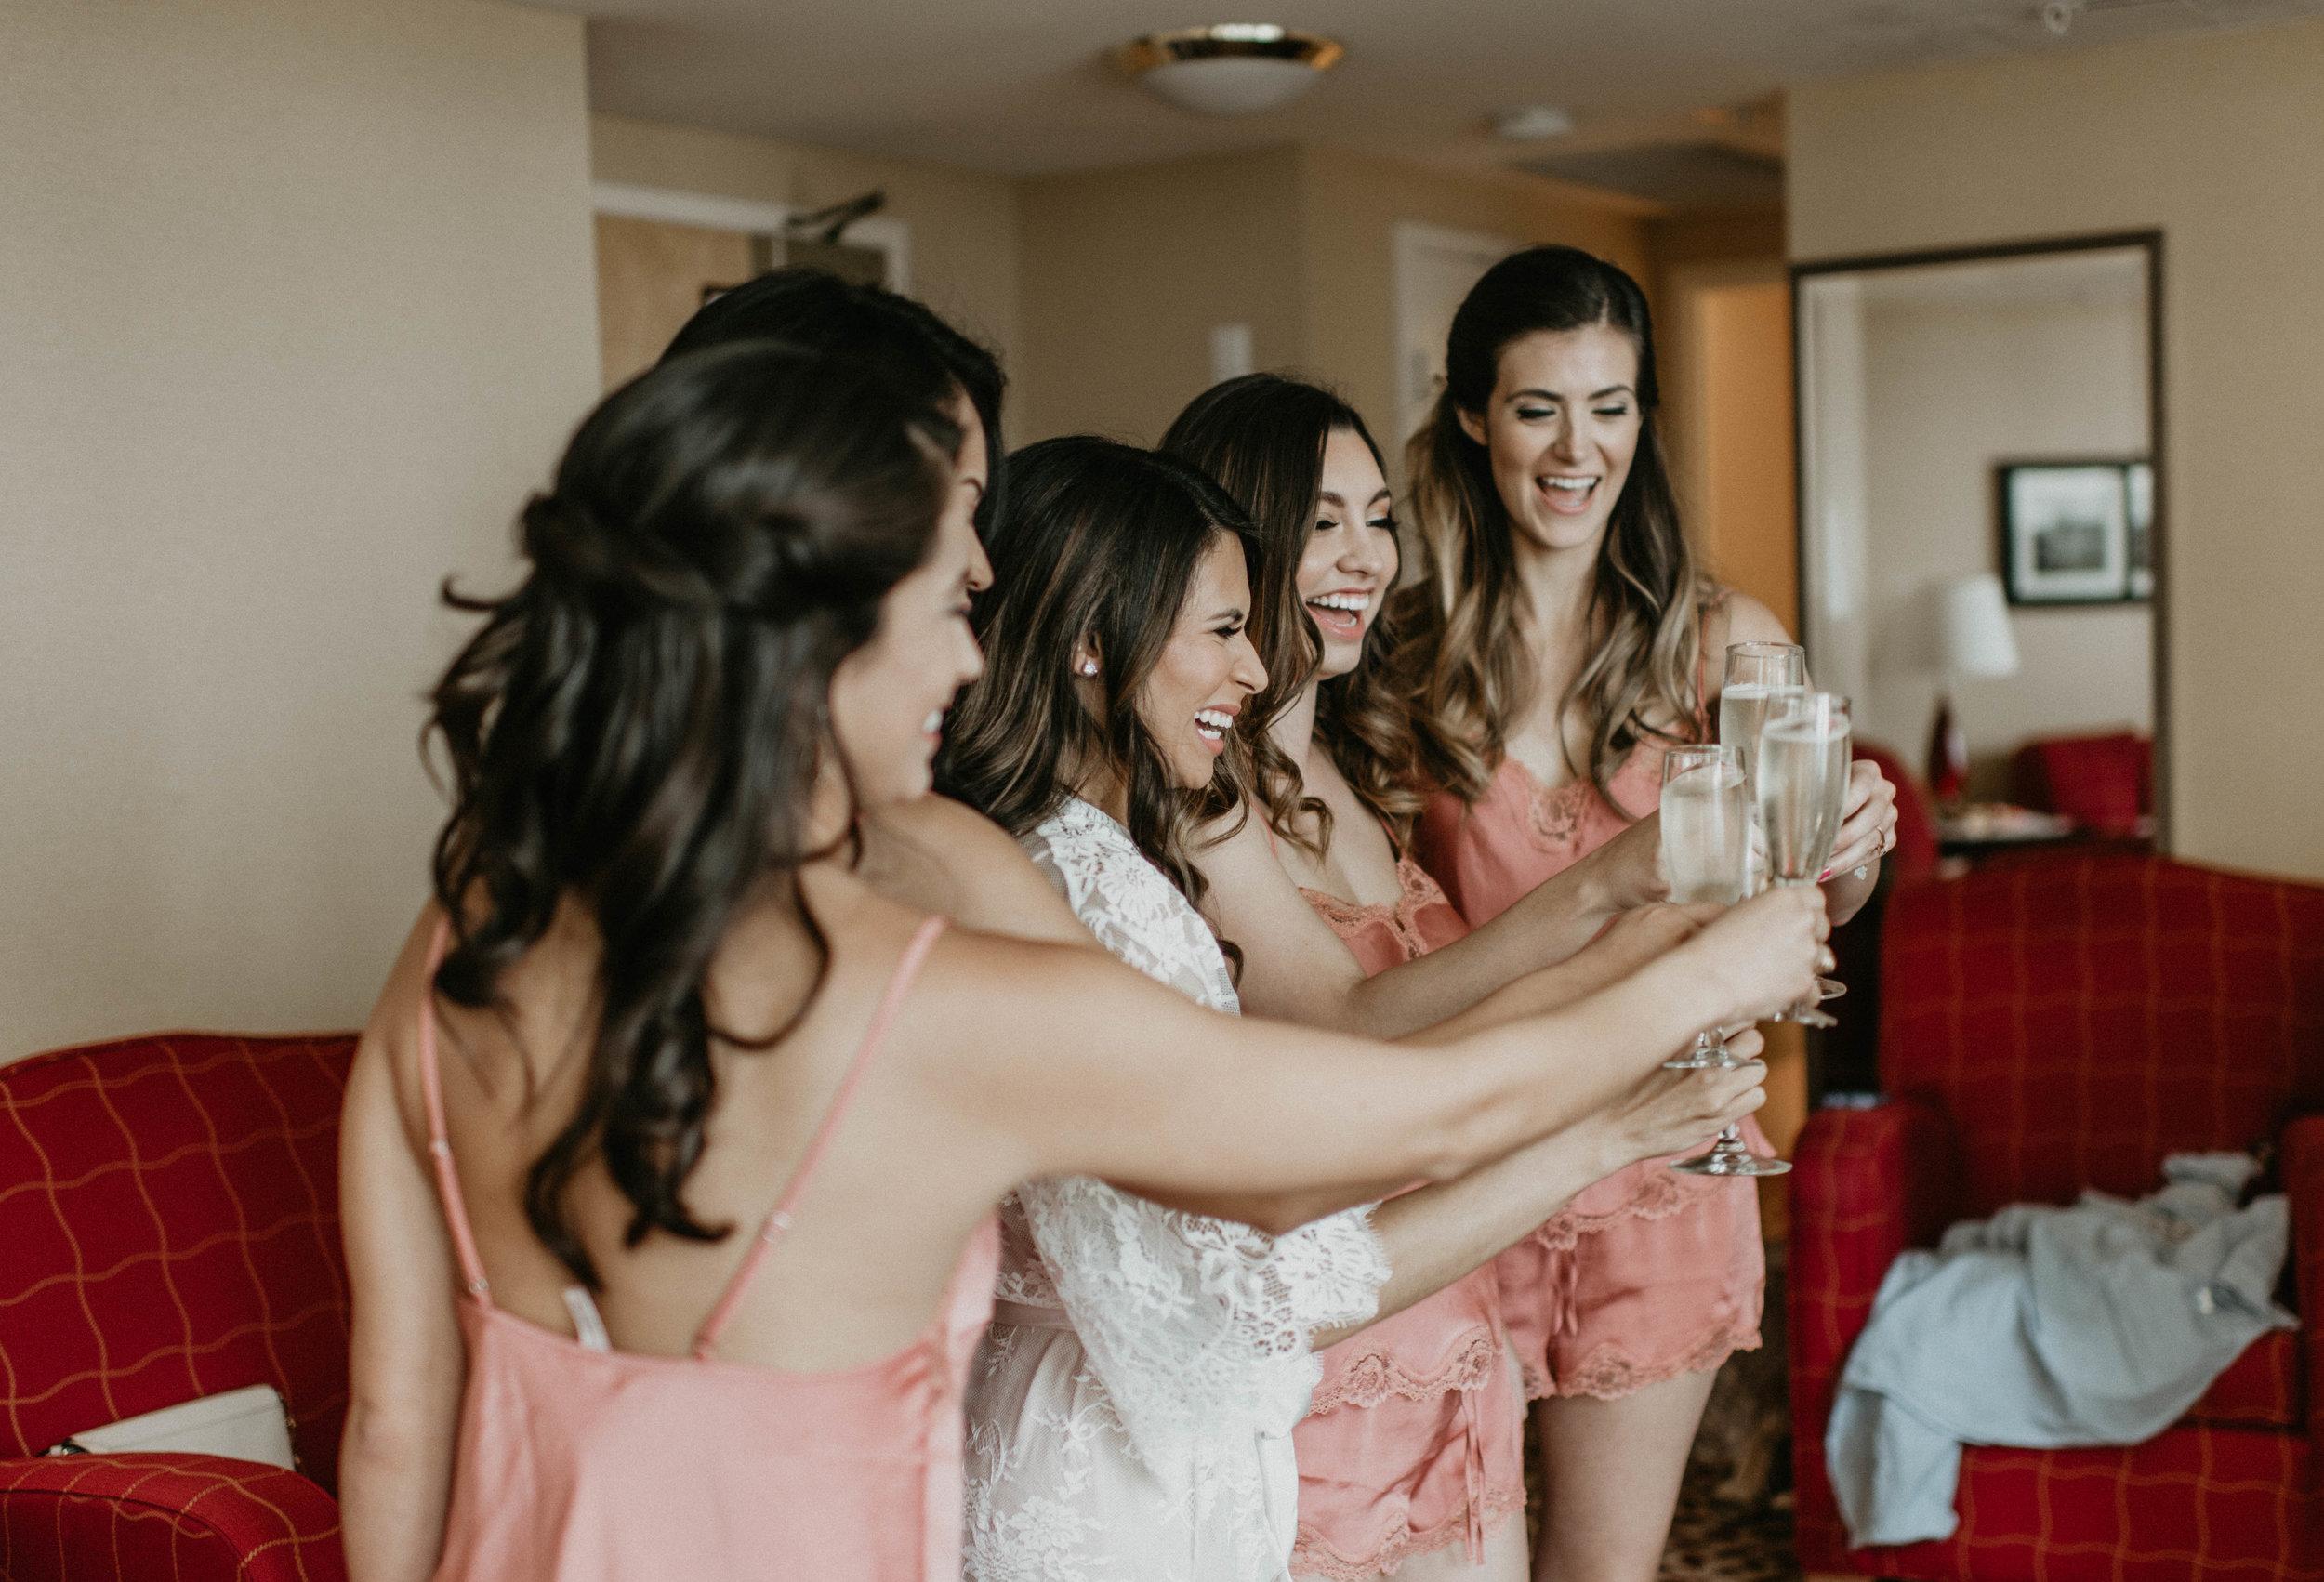 austin-texas-wedding-photography-1778-photographie-11.jpg